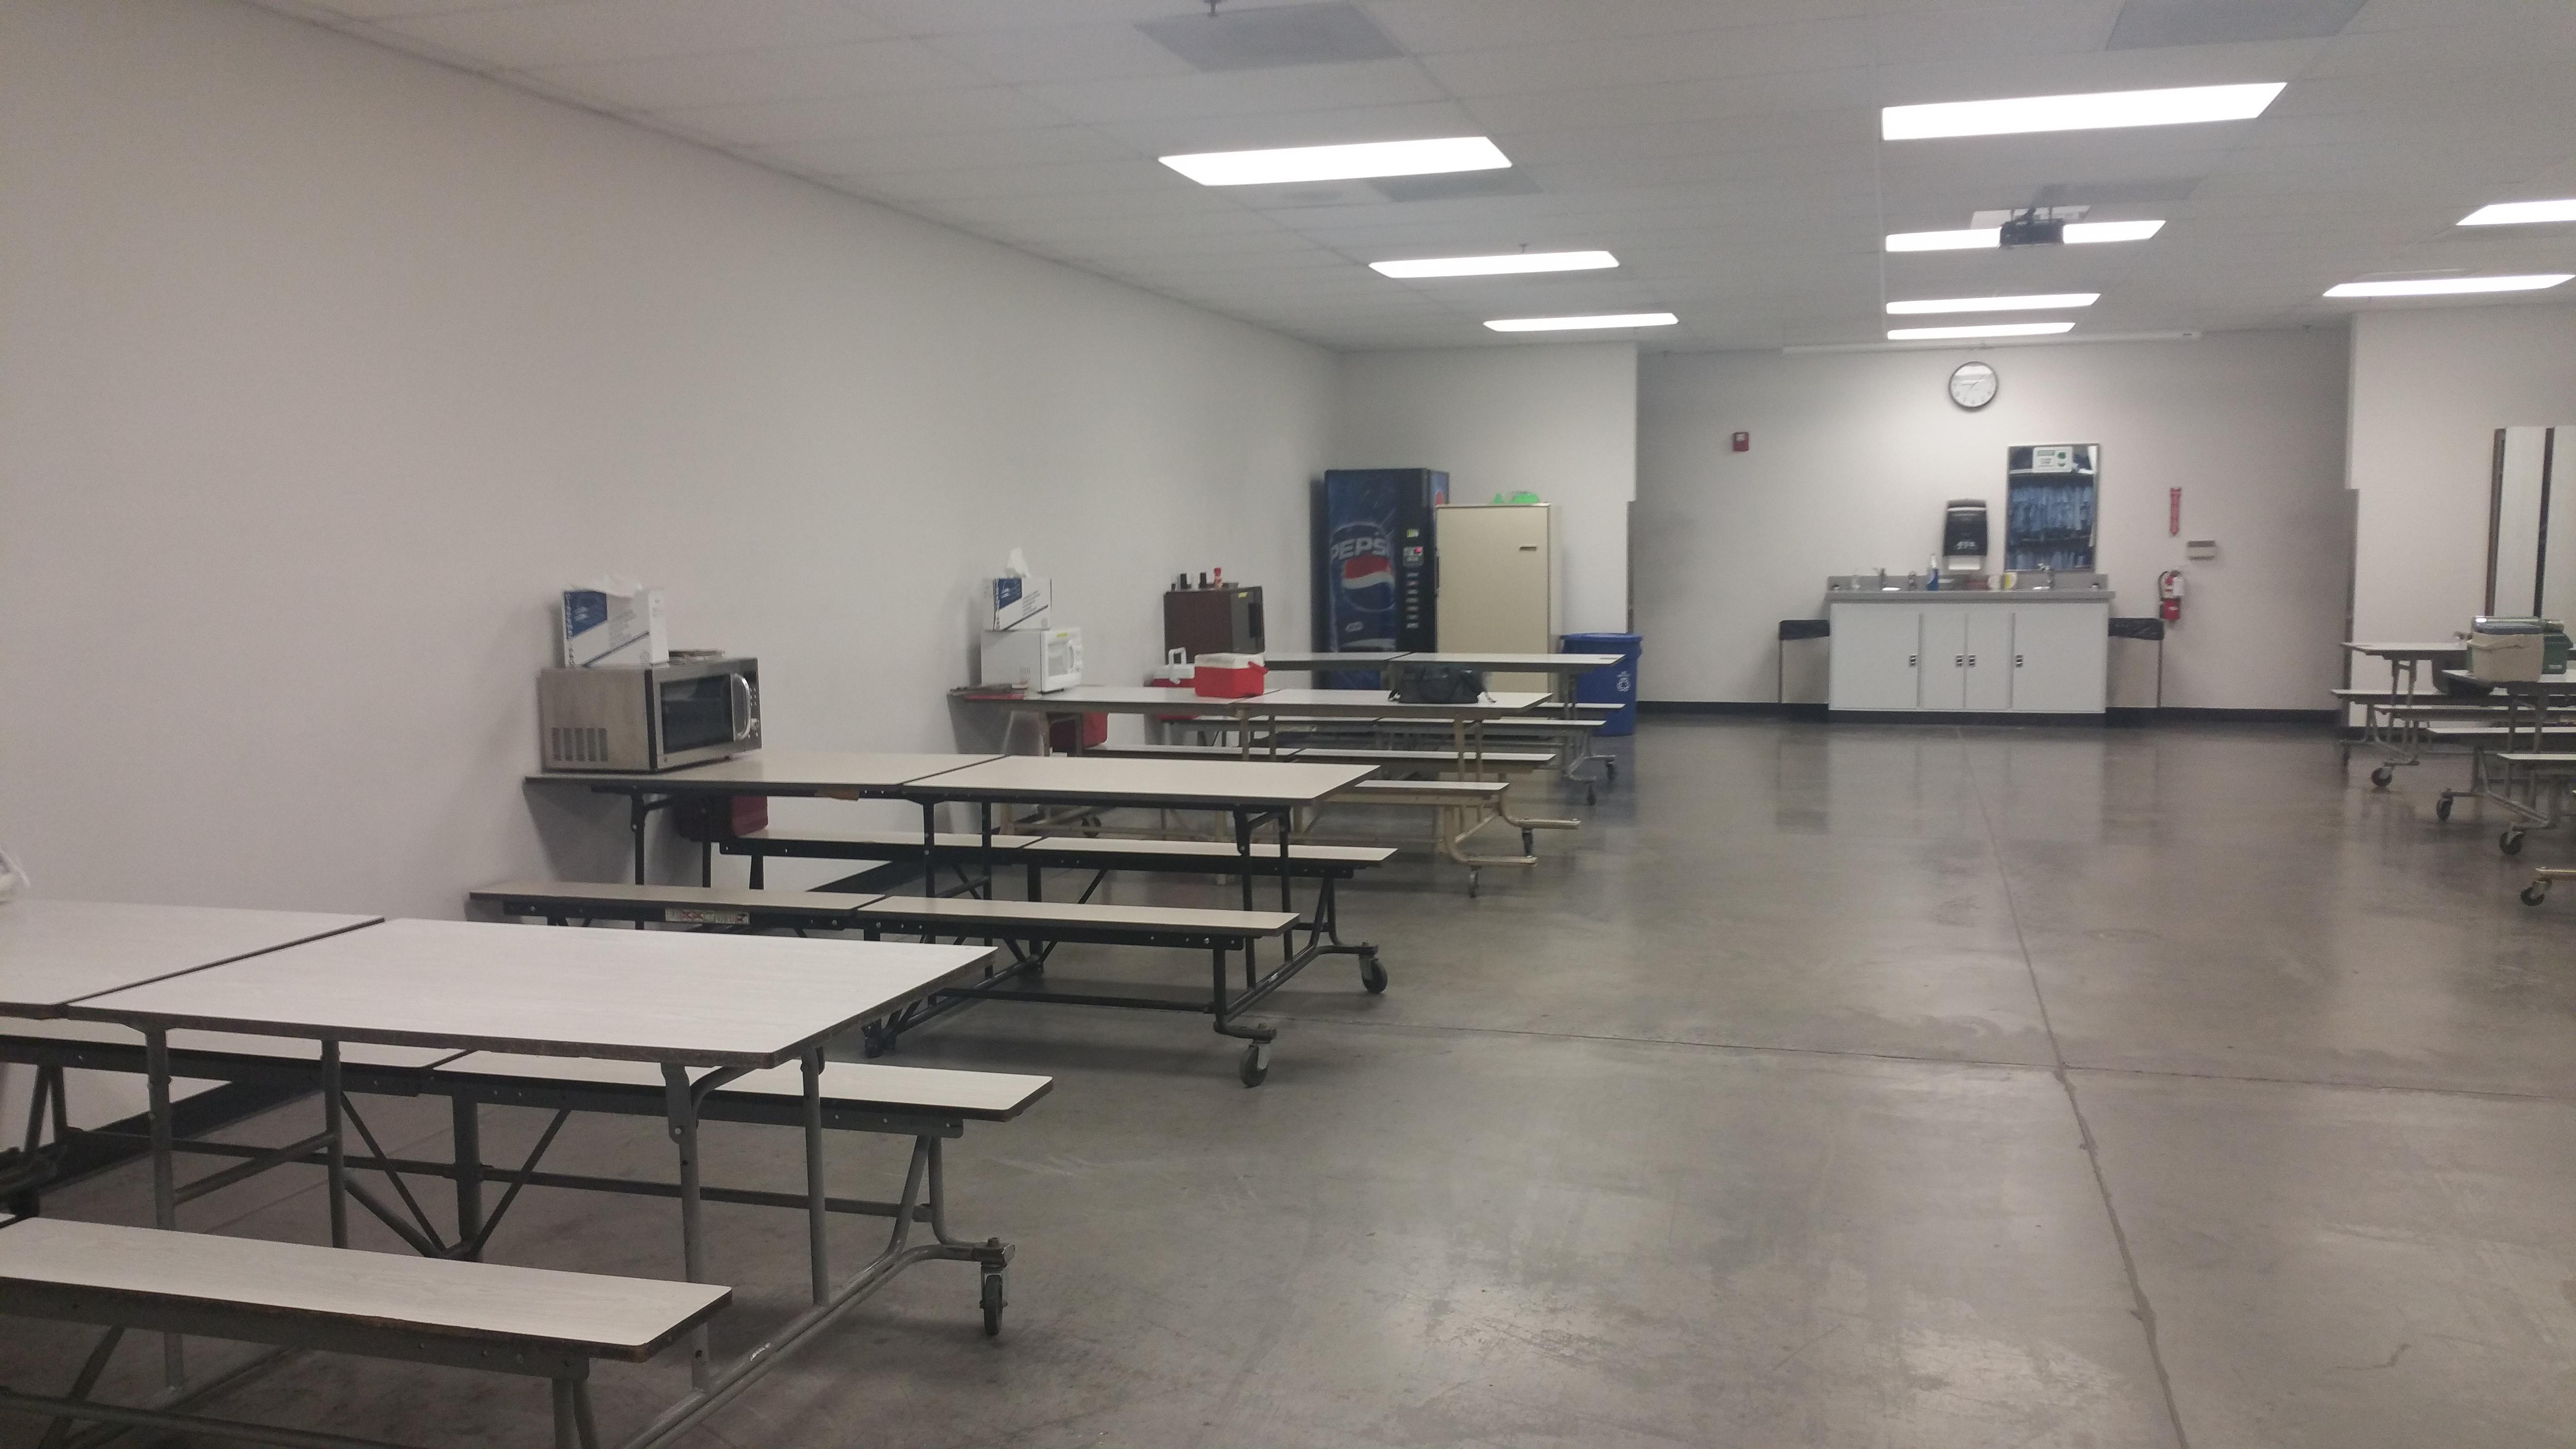 Break Room Design Ideas Part - 45: Staples Business Advantage Announces Five Finalists, Opens Voting For The  U201cUltimate Breakroom Makeoveru201d Contest | Business Wire